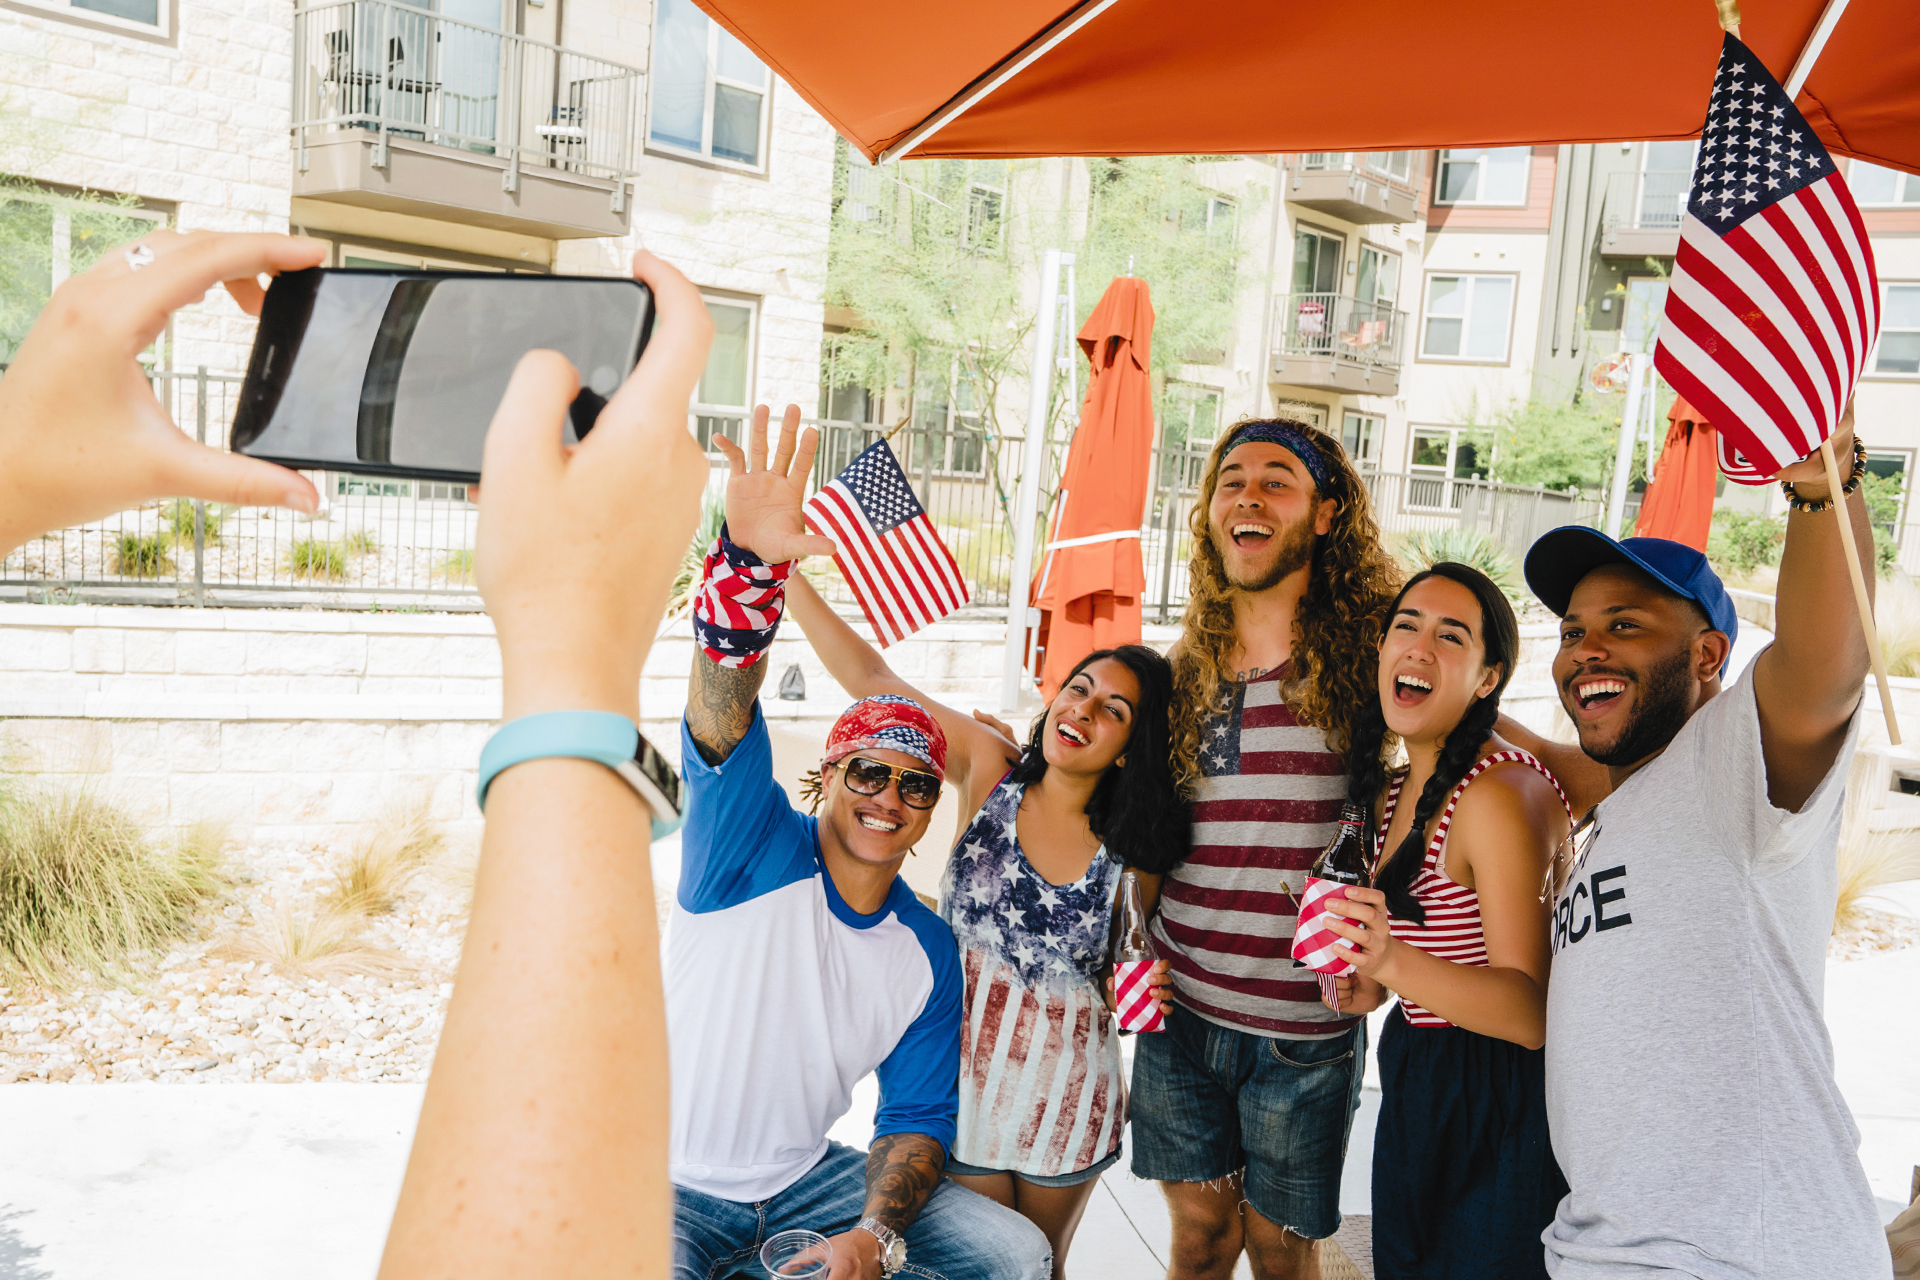 Local 4th of July Celebrations - Ohio Main Photo